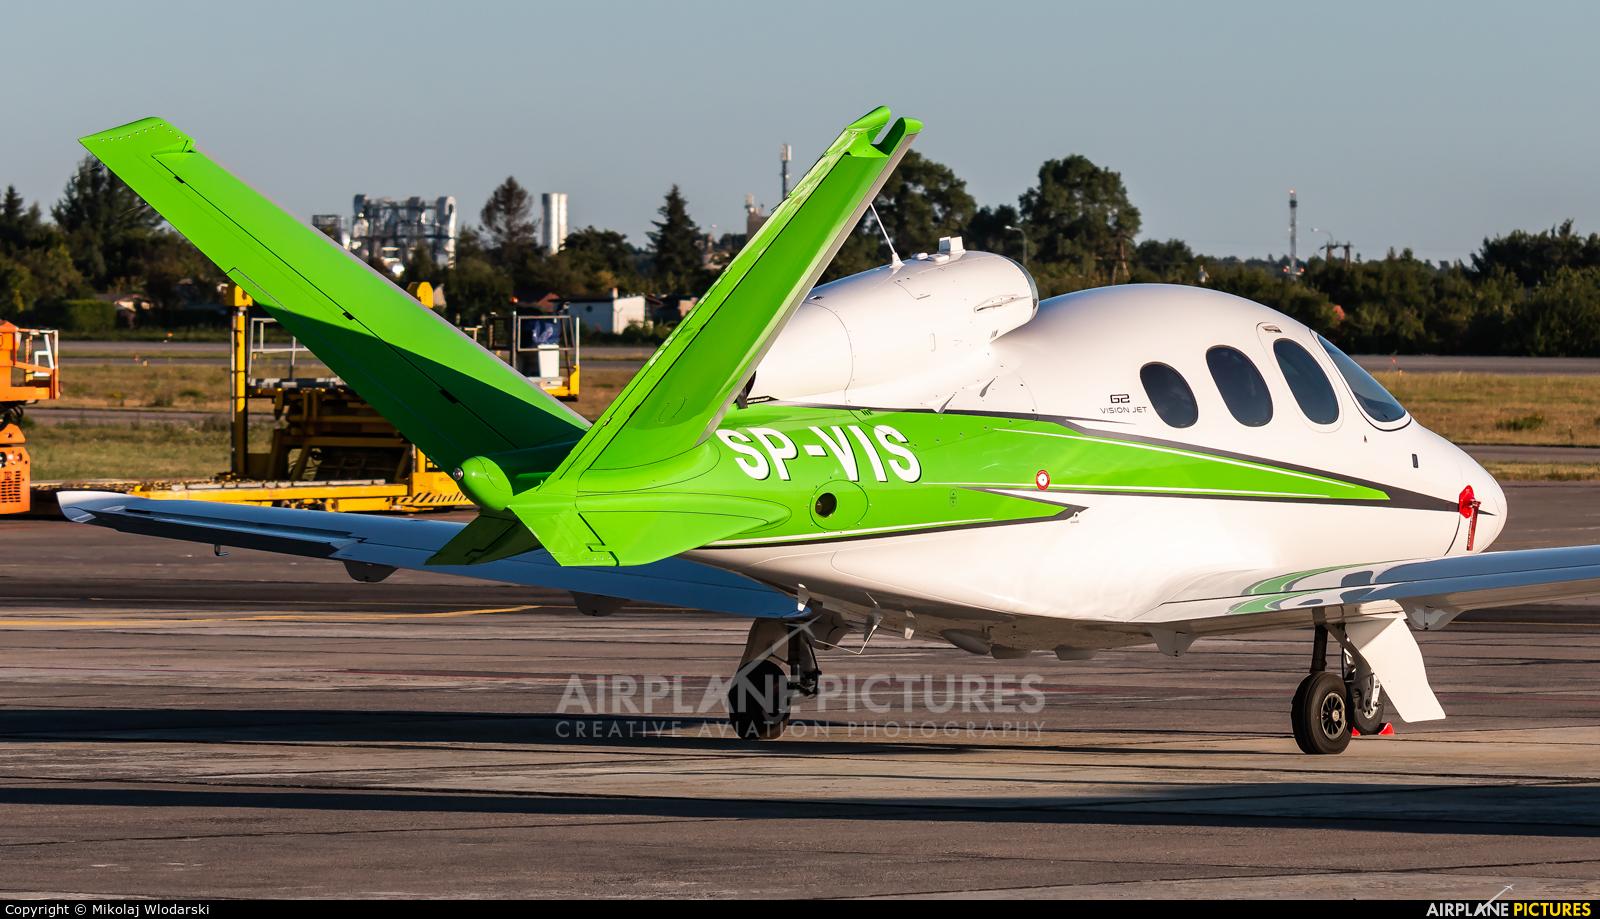 Cirrus Aircraft Poland & Baltics SP-VIS aircraft at Gdańsk - Lech Wałęsa